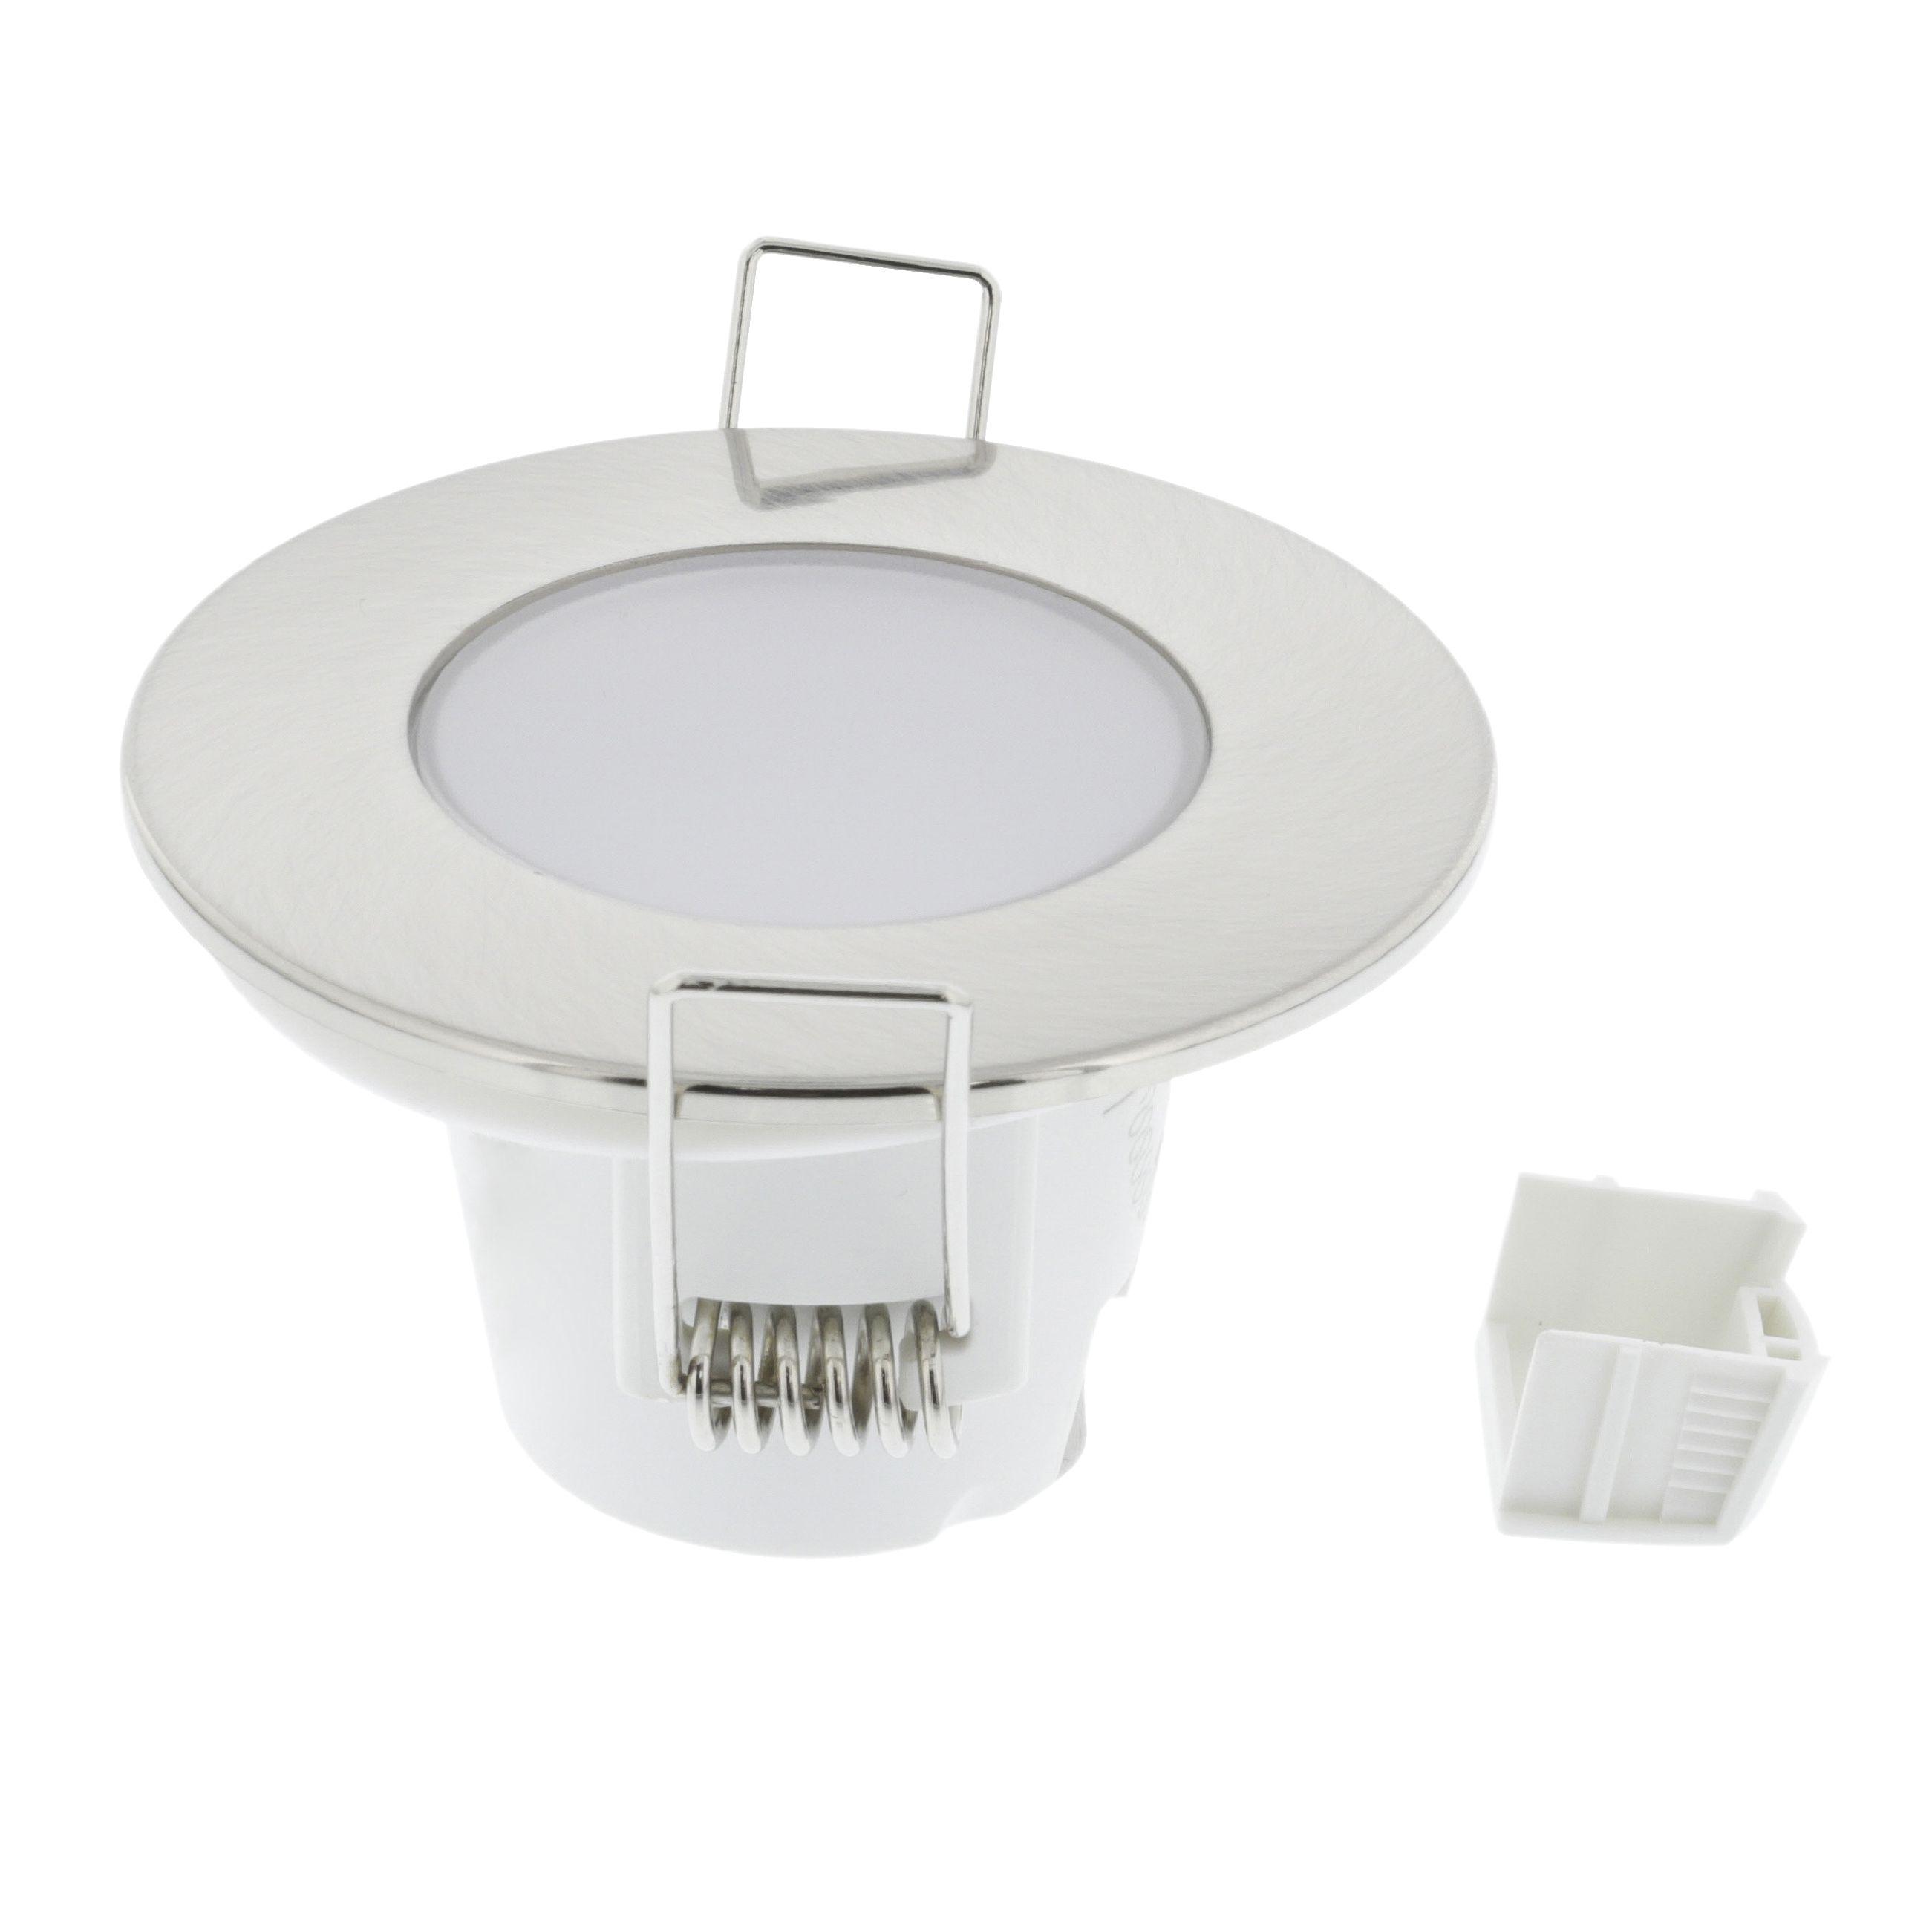 LED-Einbauleuchte 4.6 W 2700 K 350 lm